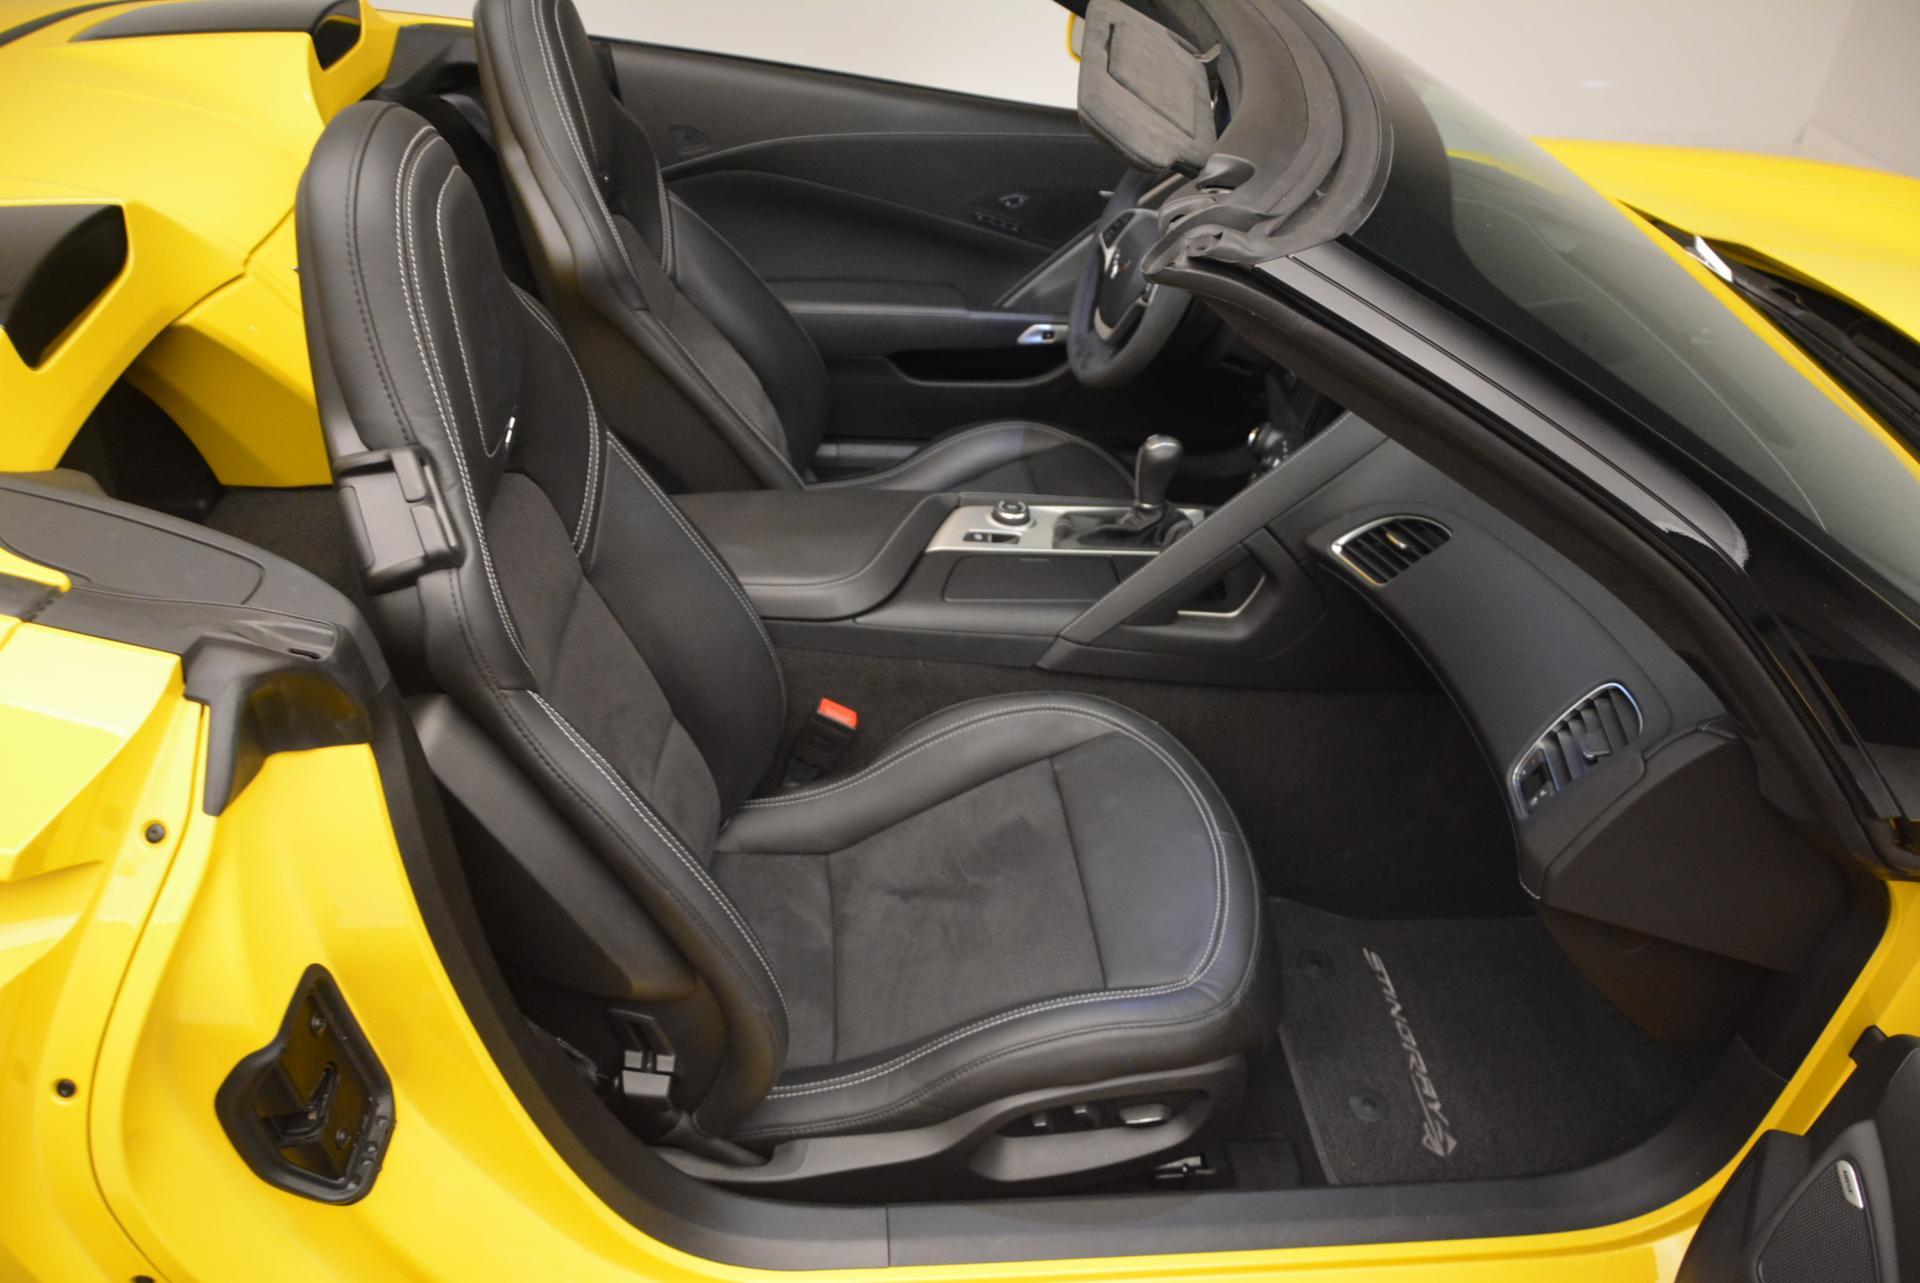 Used 2014 Chevrolet Corvette Stingray Z51 For Sale In Greenwich, CT 523_p19